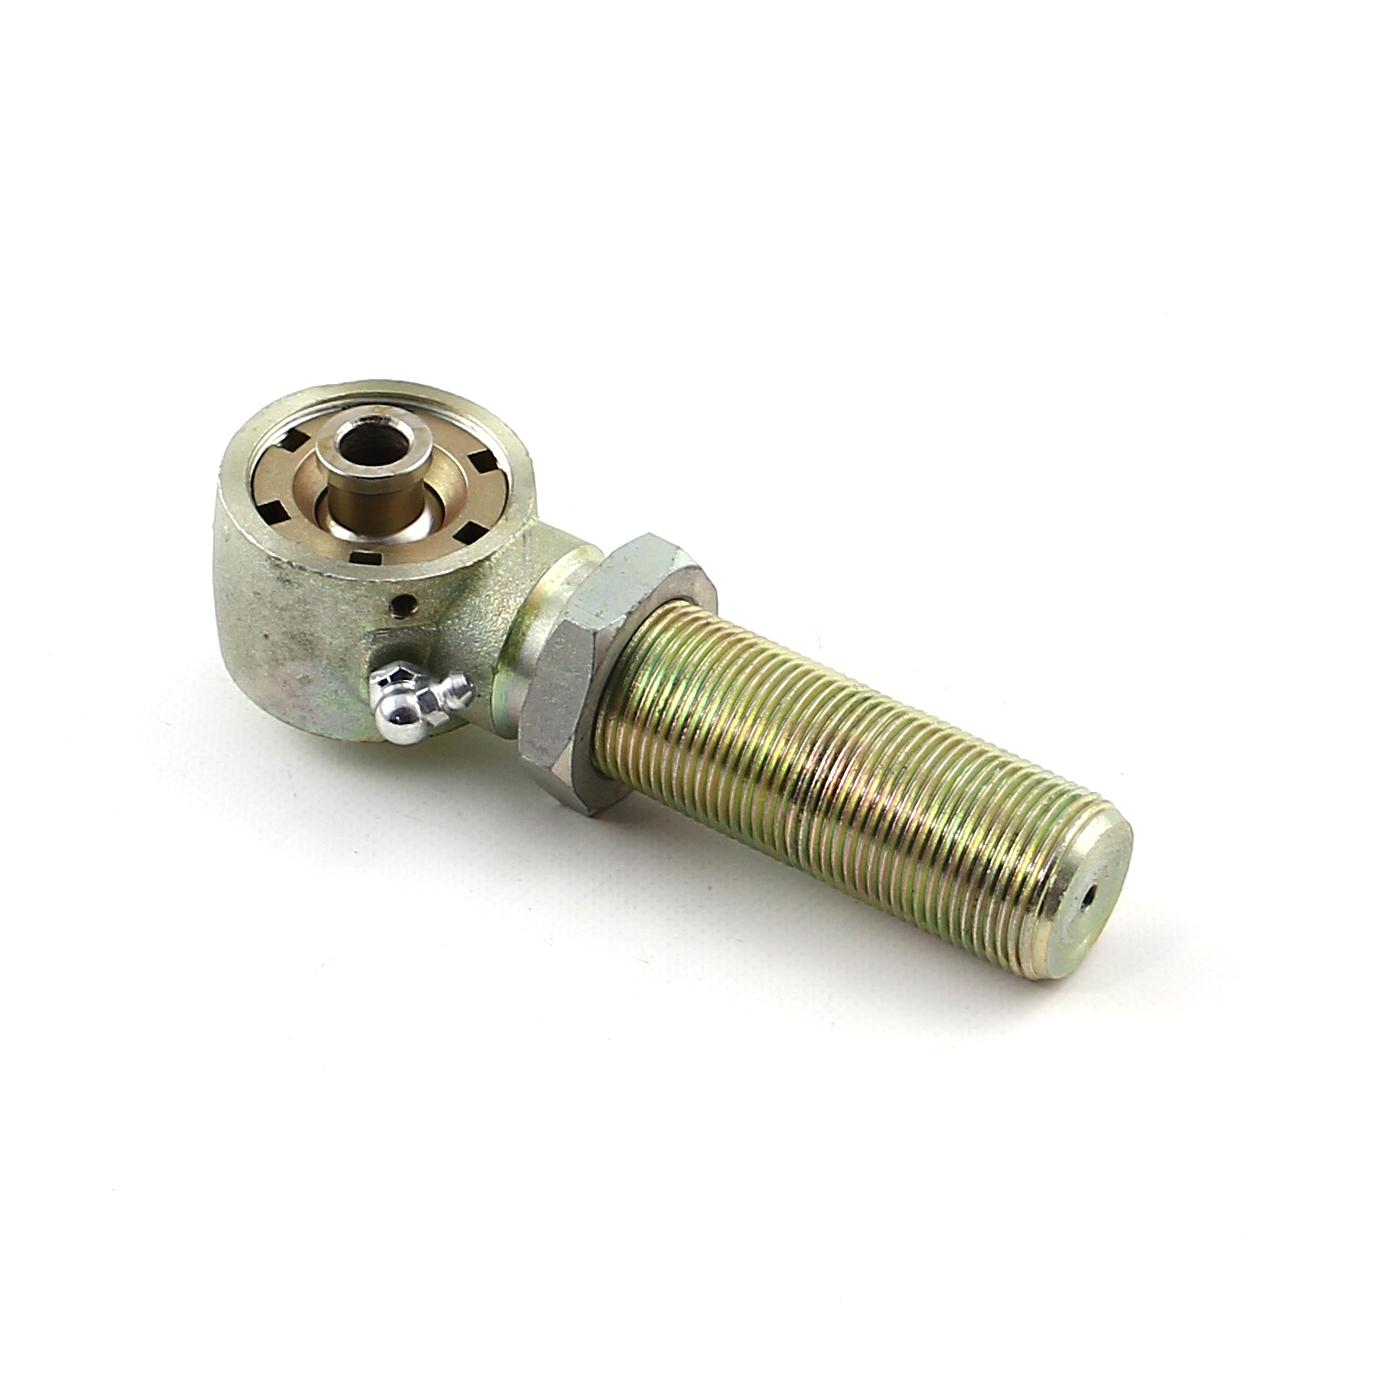 "Rod End 2"" Forged Flex Joint Right Hand RH Thread w/Jam Nut"